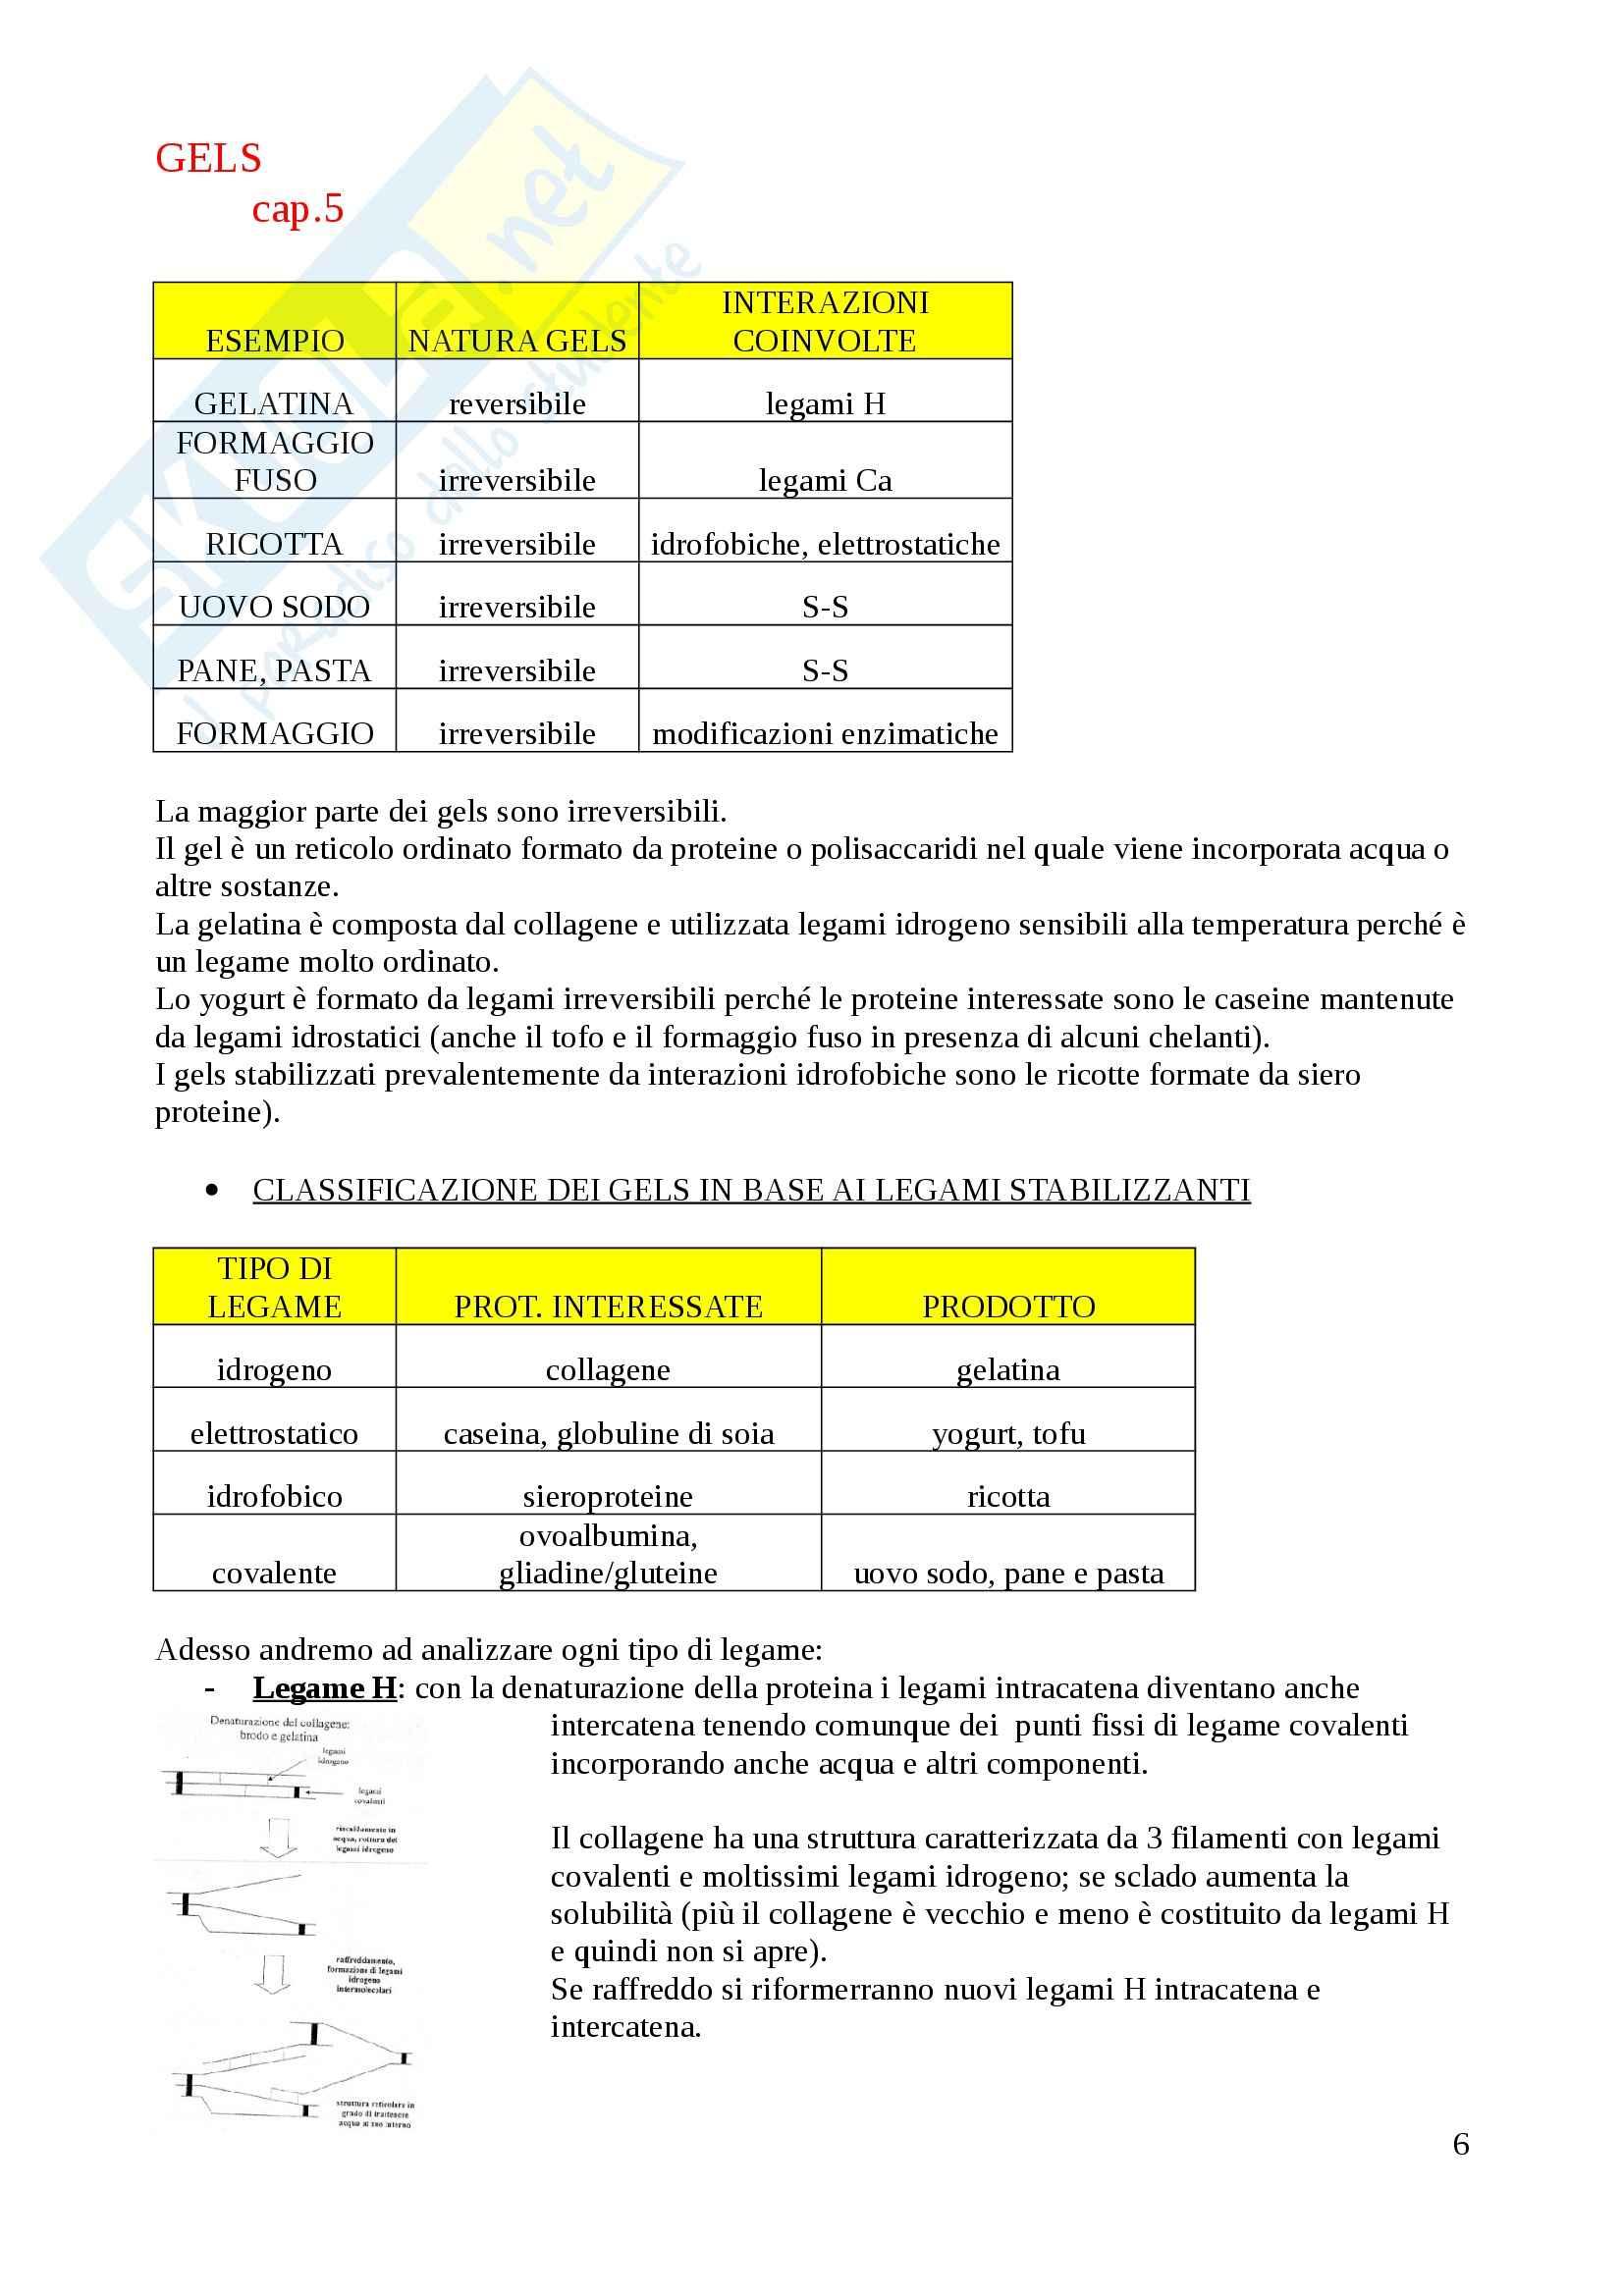 Biochimica alimentare - biochimica alimentare Pag. 6